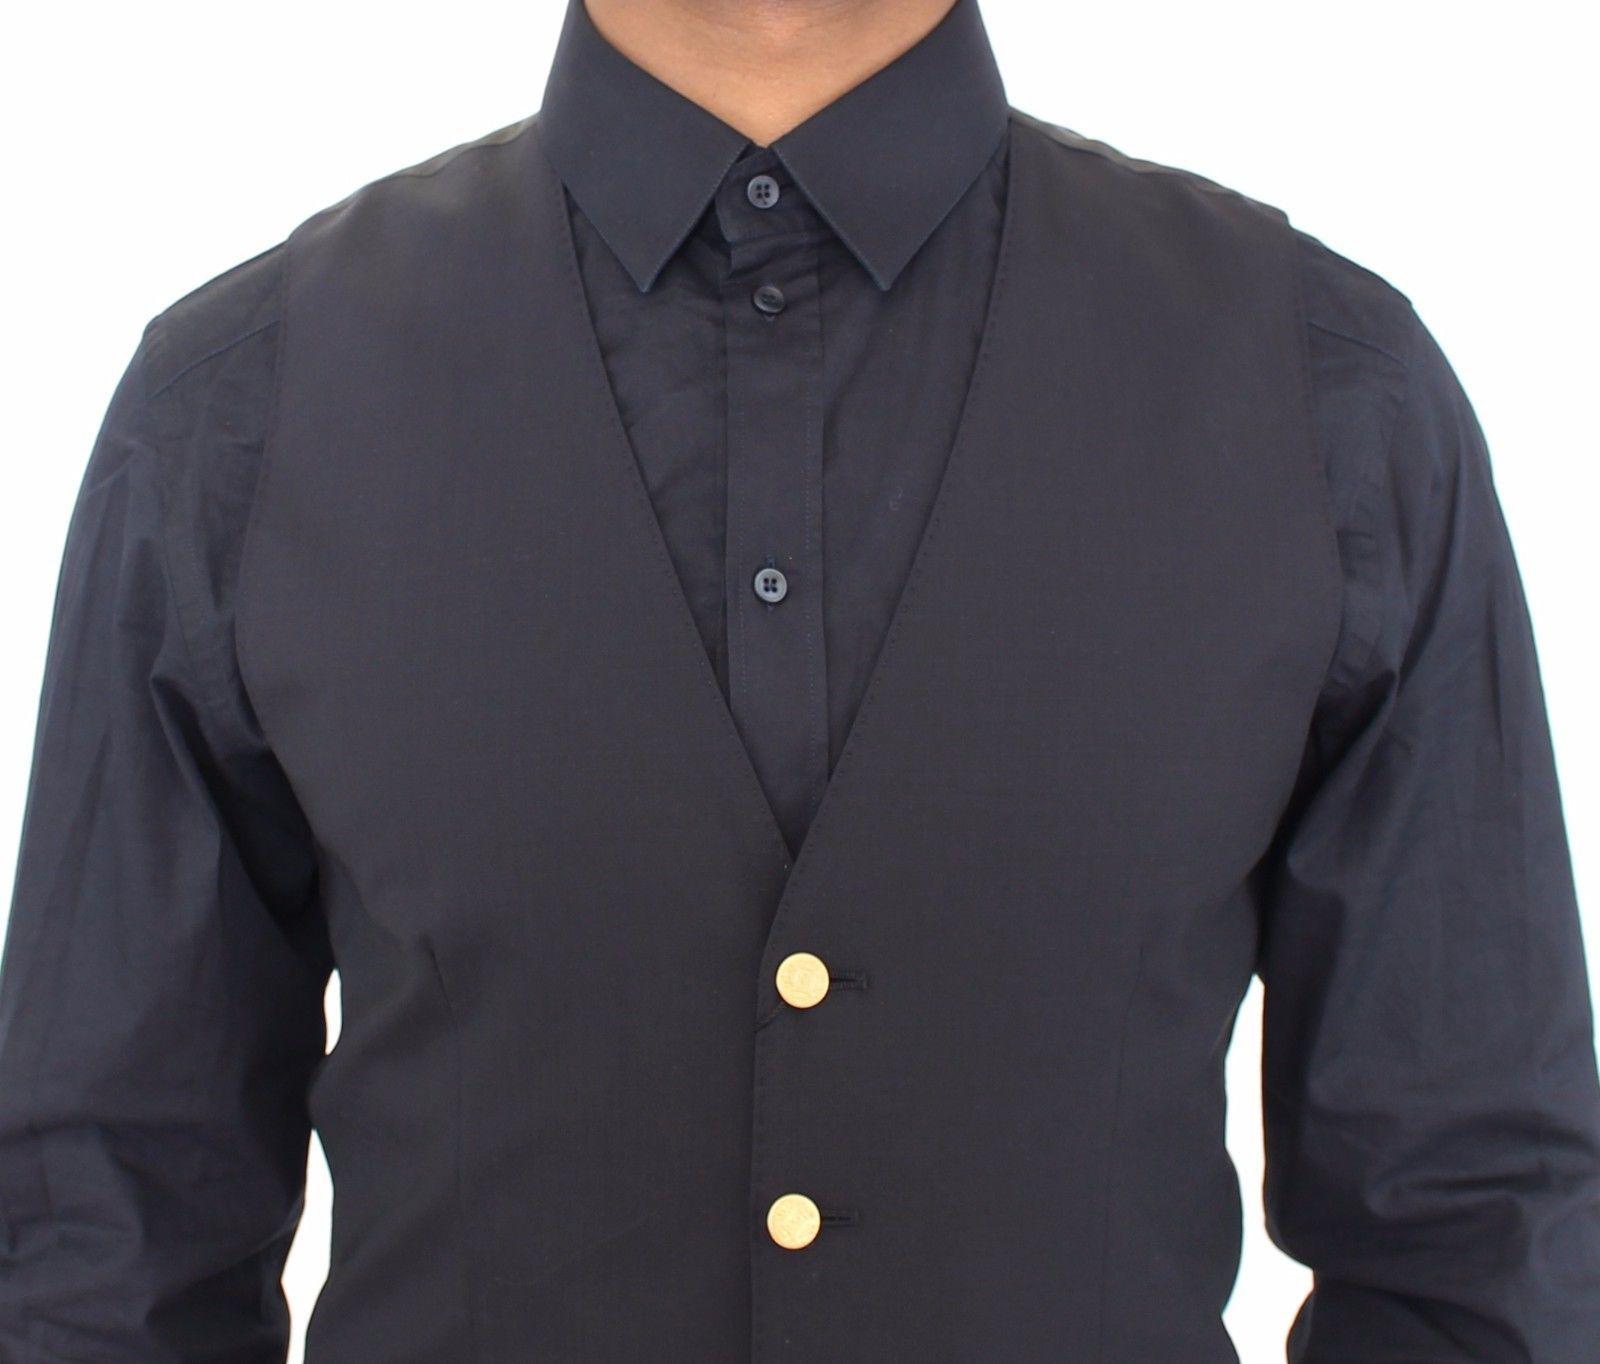 Dolce & Gabbana Blue Wool Stretch Formal Dress Vest Gilet